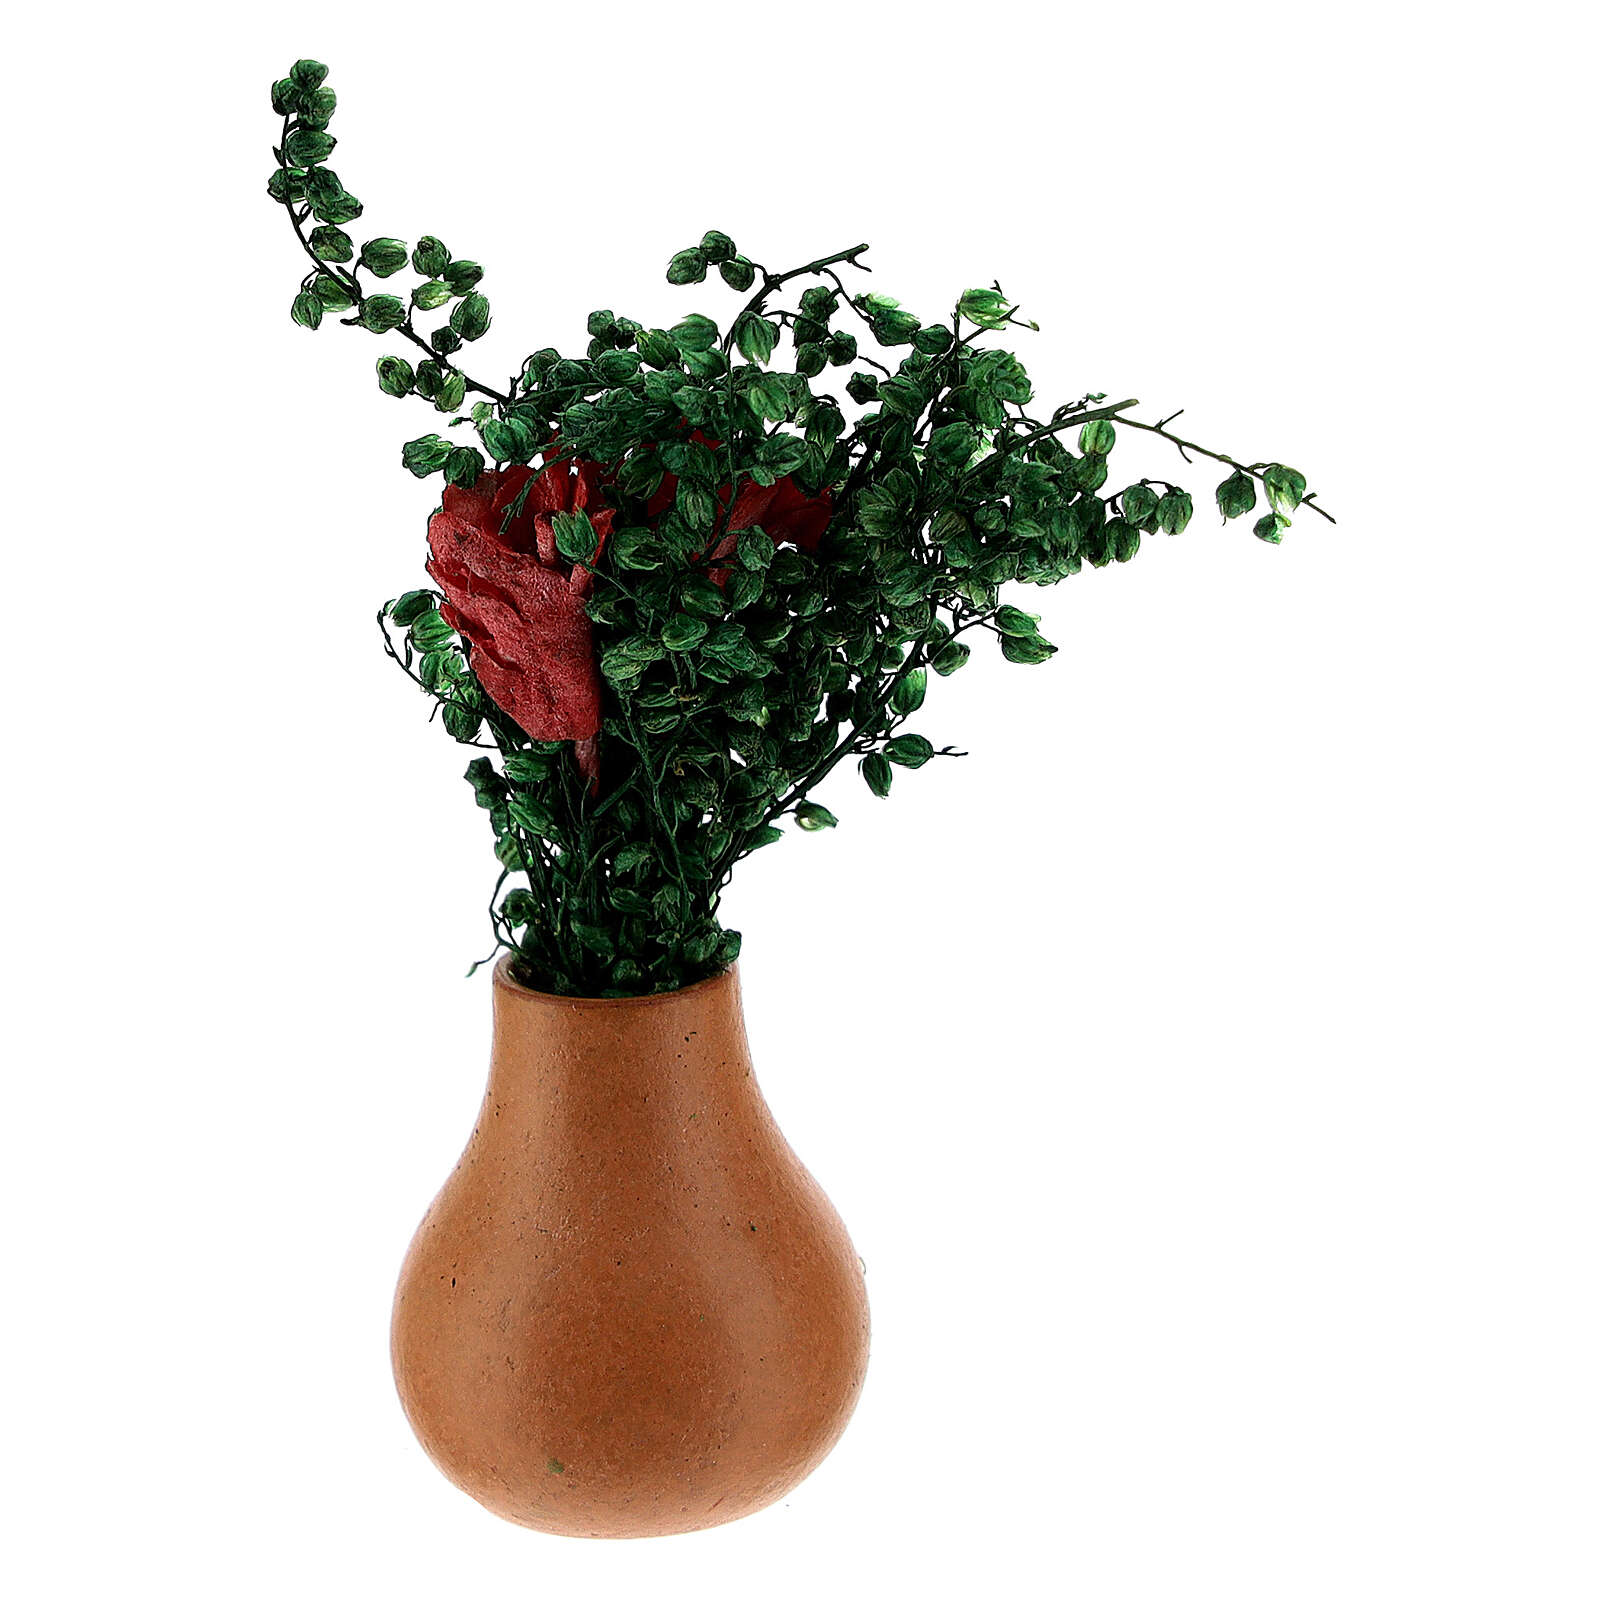 Mixed cactus jar Nativity scene 8 cm 4